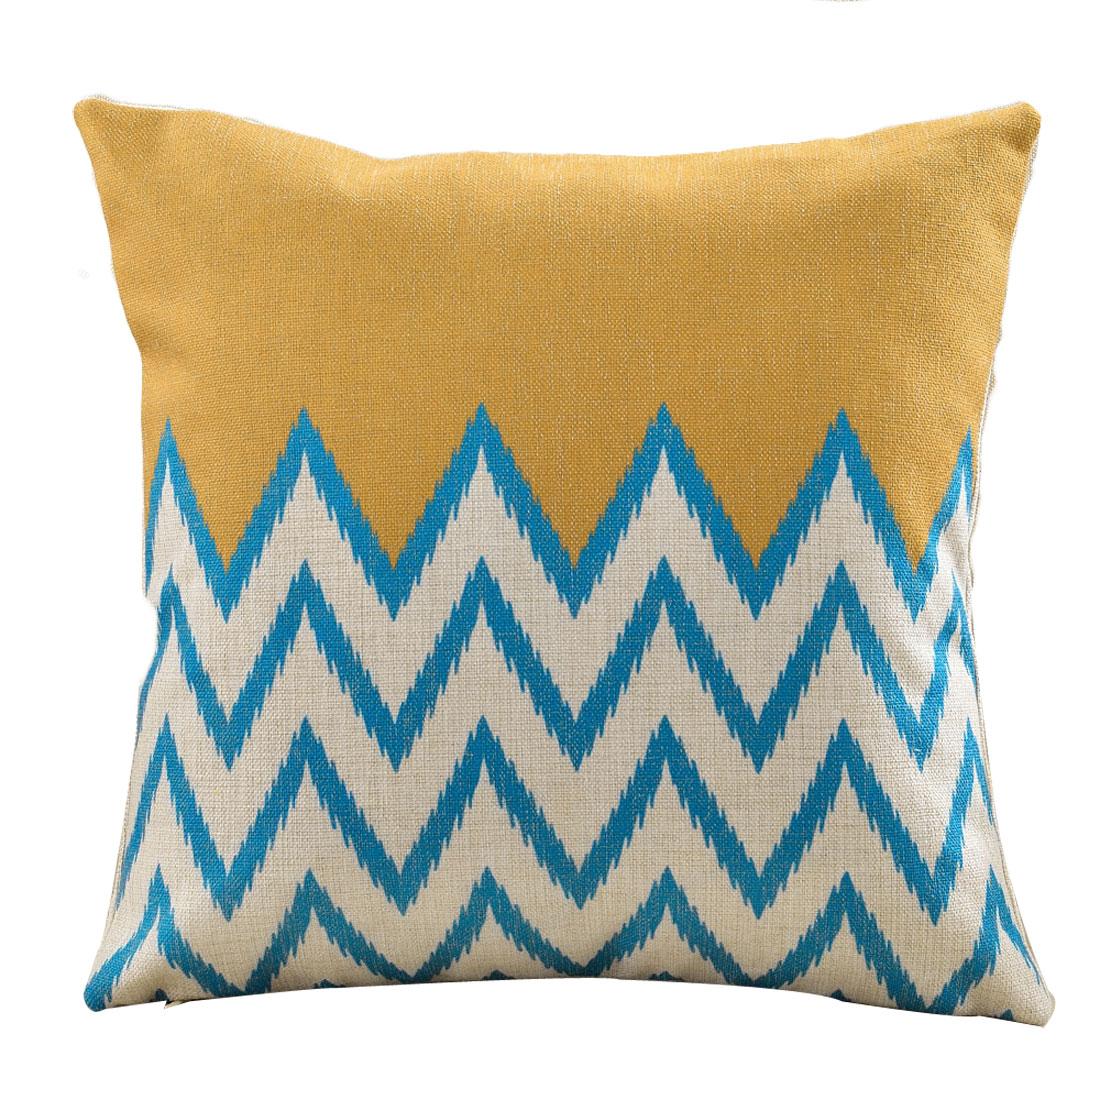 Couch Car Seat Cotton Linen Pop Geometric Pattern Waist Throw Cushion Pillow Cover